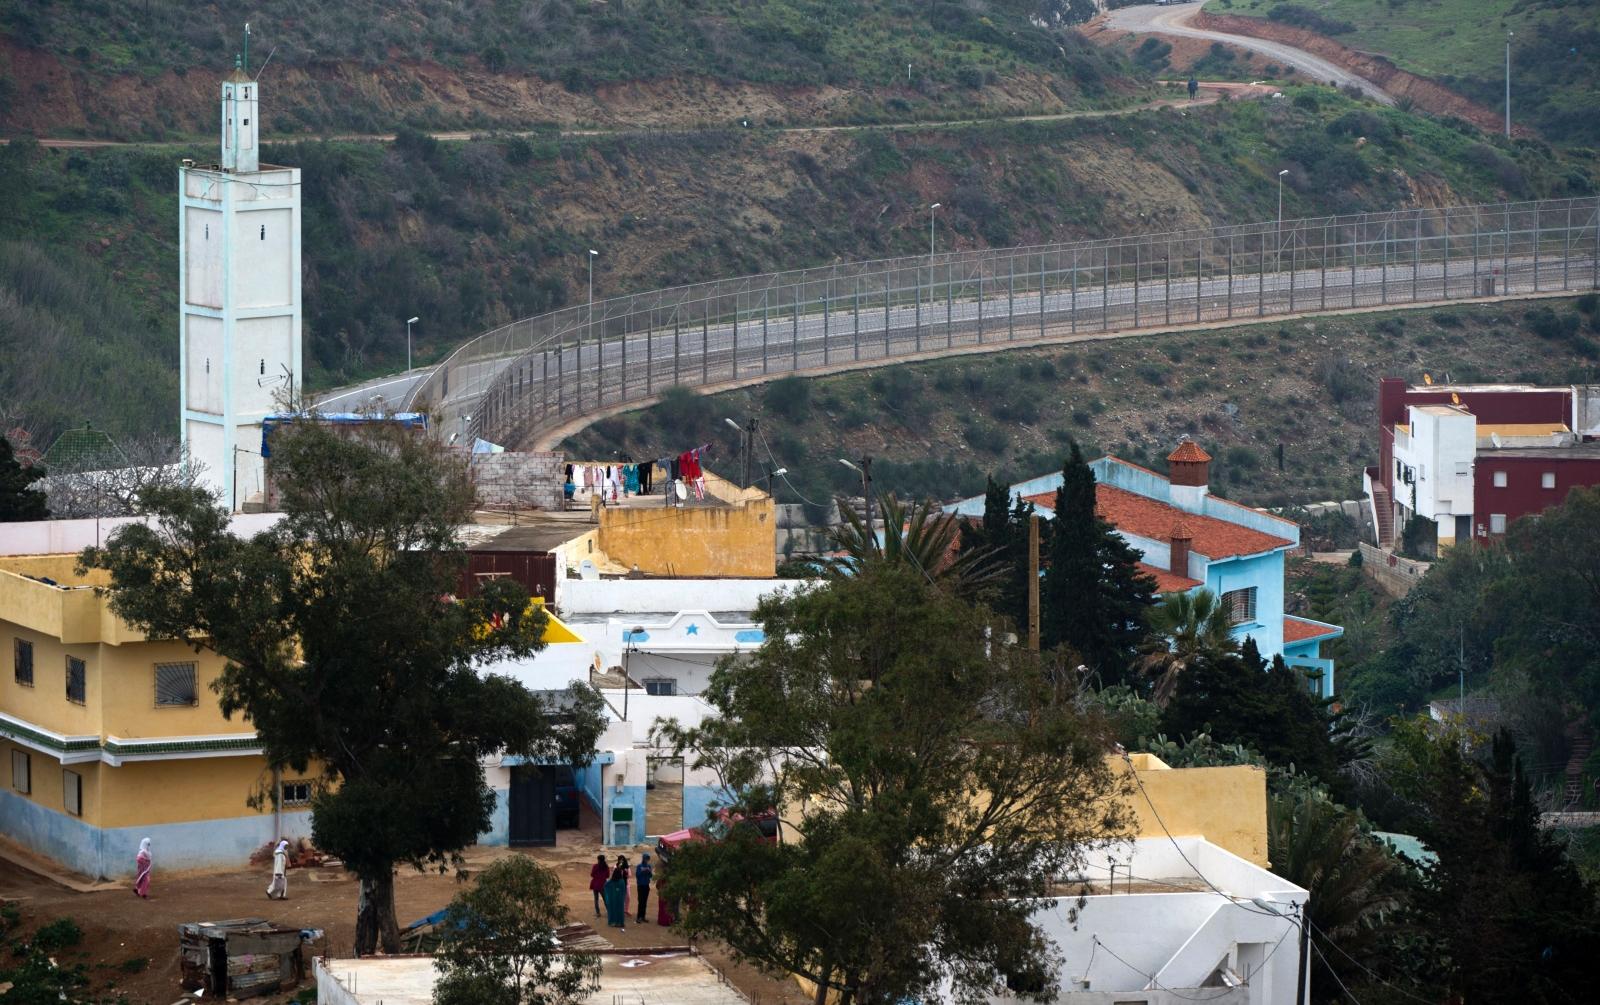 Ceuta-Morocco border